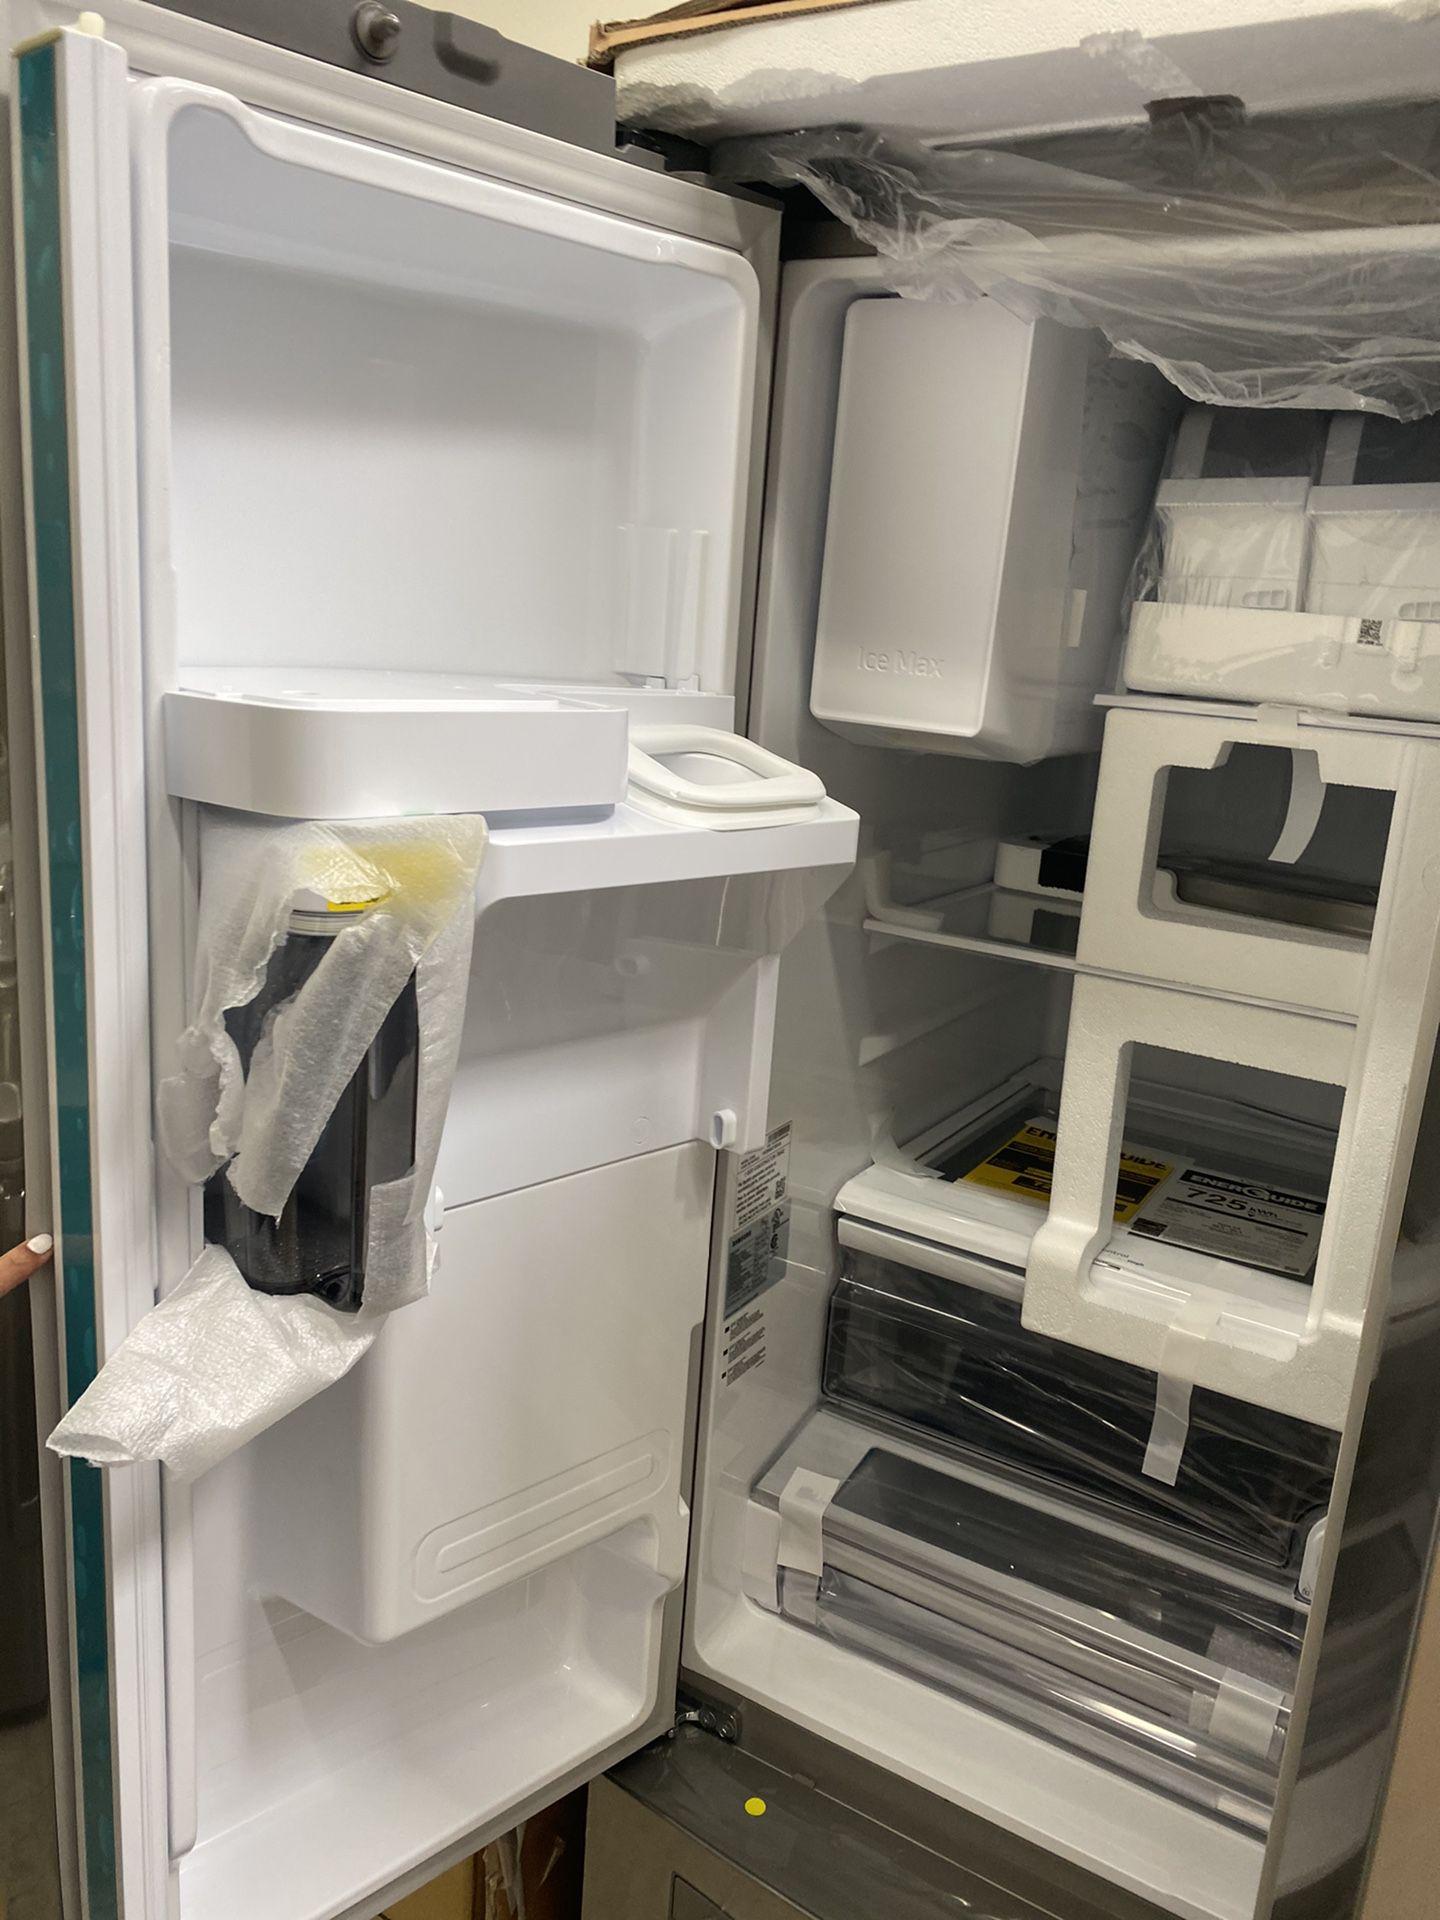 NEW ! 28 CU FT 3 DOOR SAMSUNG REFRIGERATOR IN STAINLESS STEEL WITH ICE/WATER DISPENSER